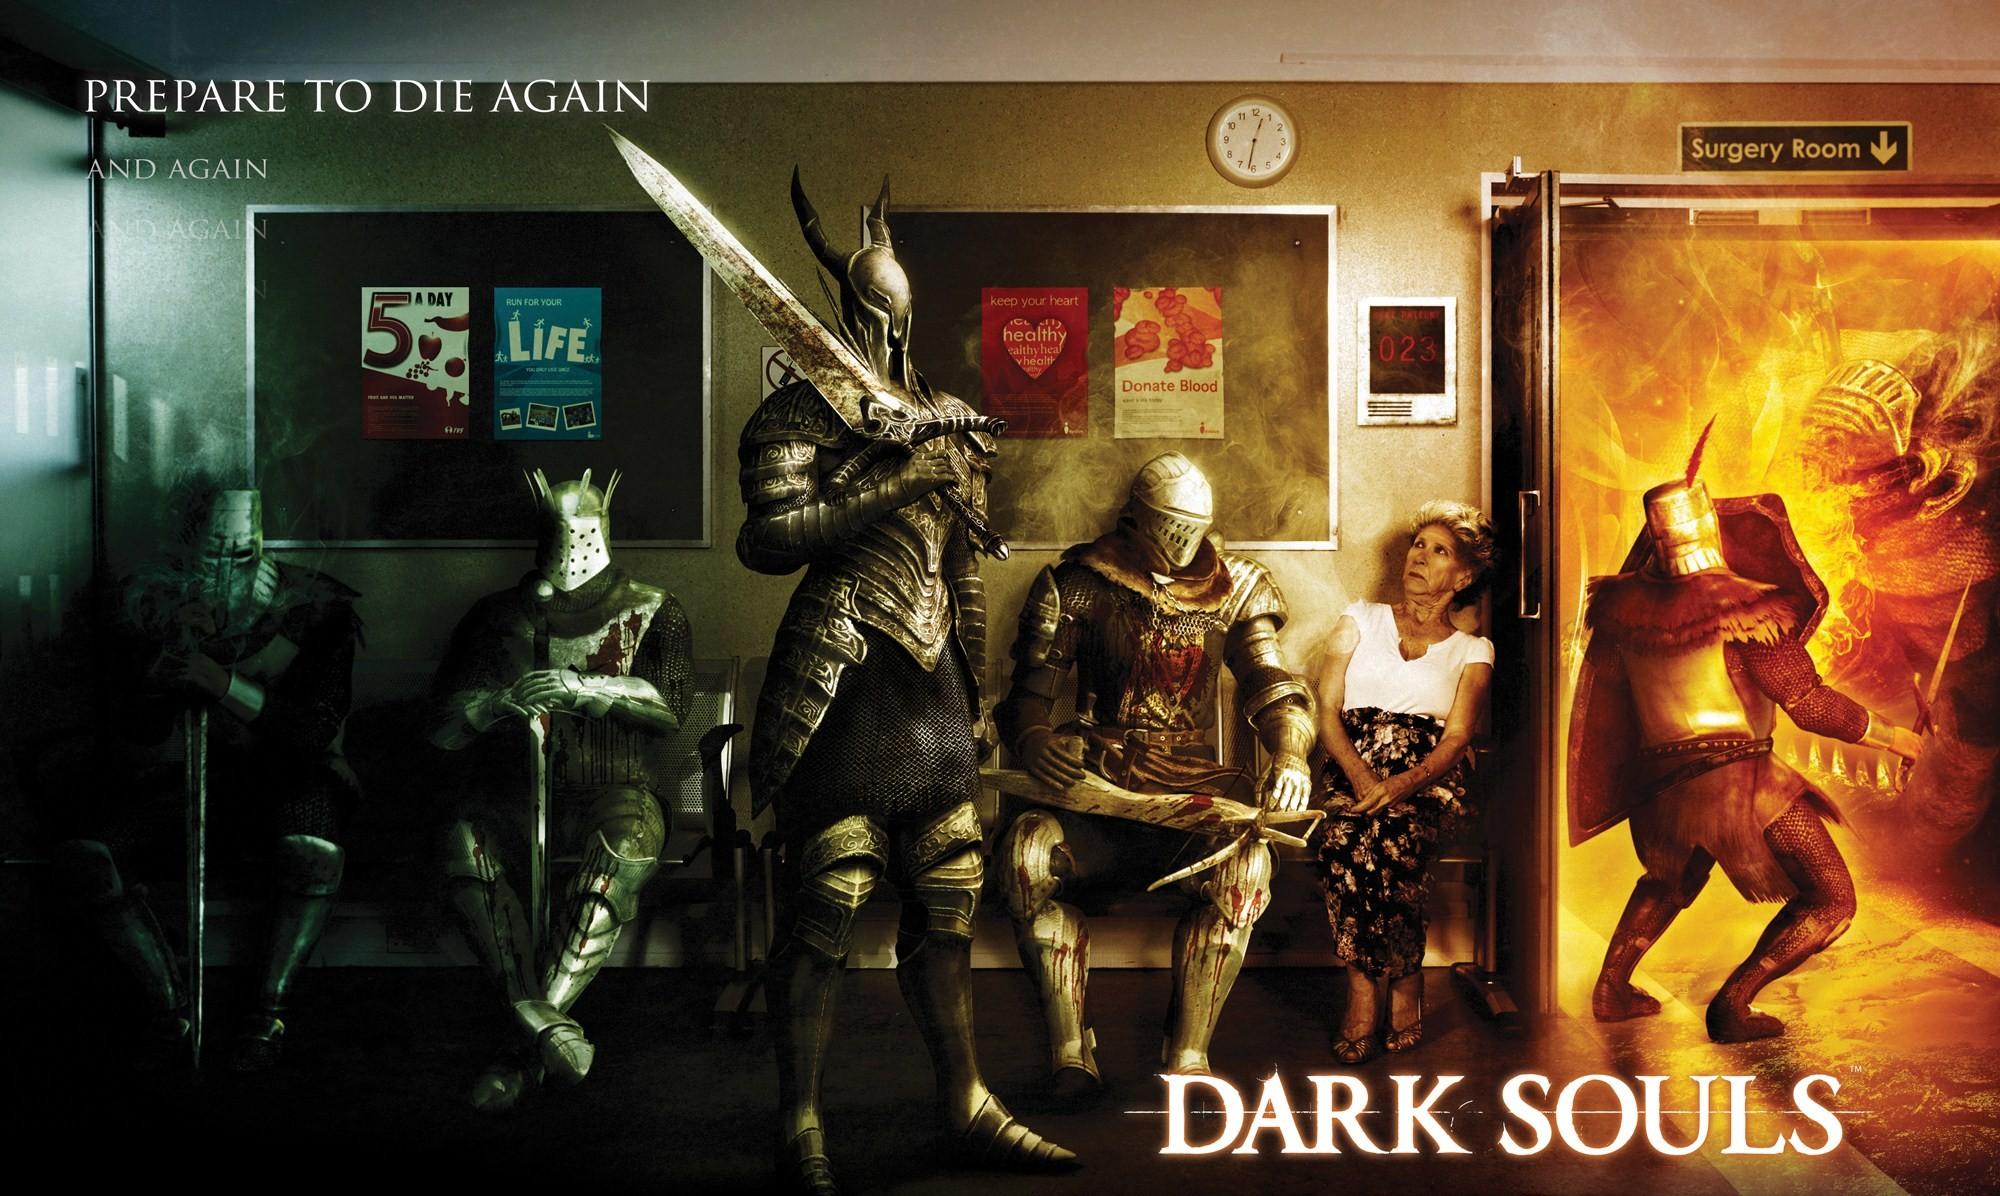 187 Dark Souls HD Wallpapers